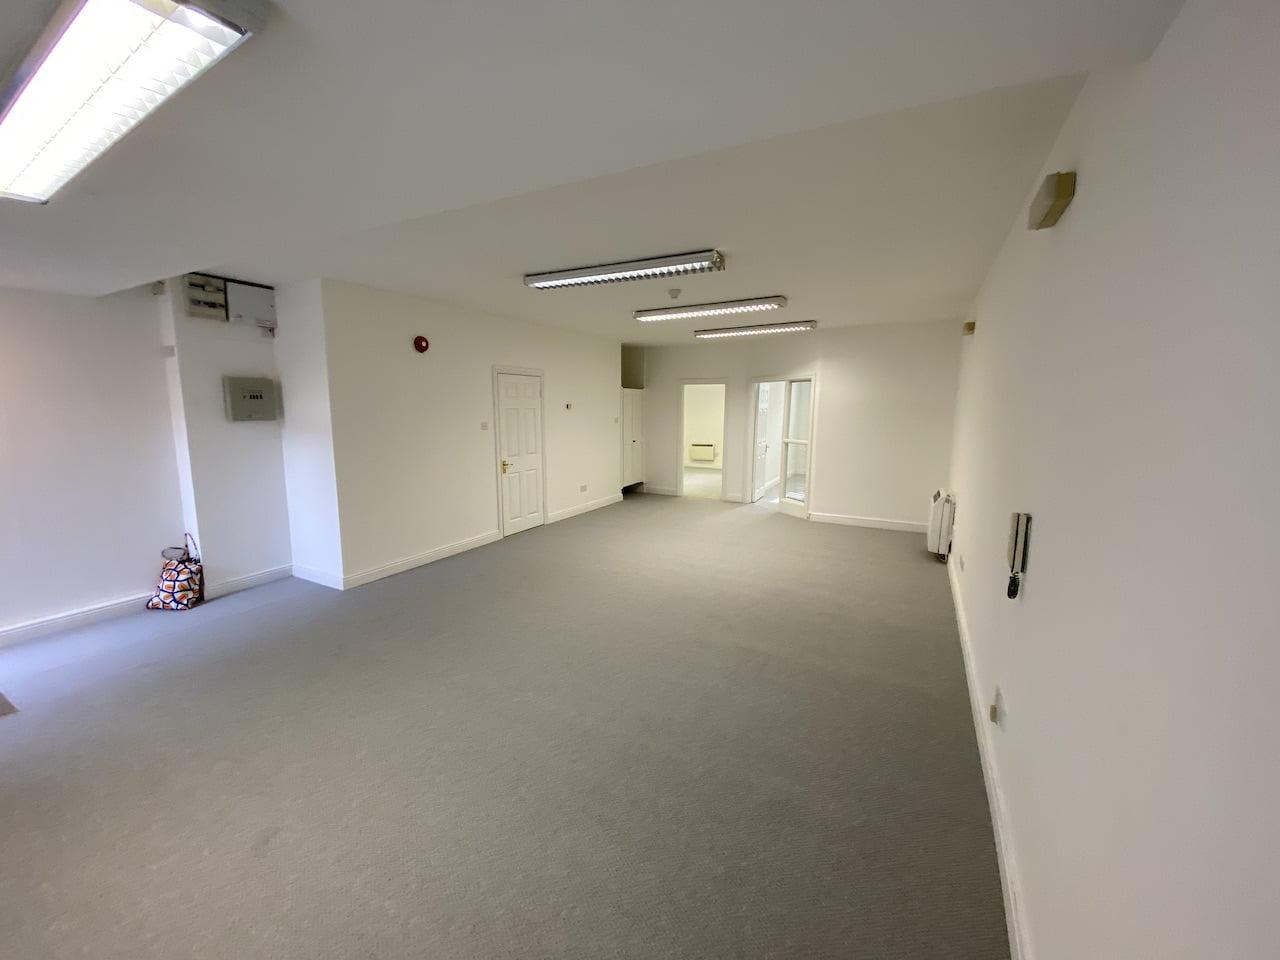 Blackrock. Co. Dublin – 16 Priory Office Park *** SOLD ***